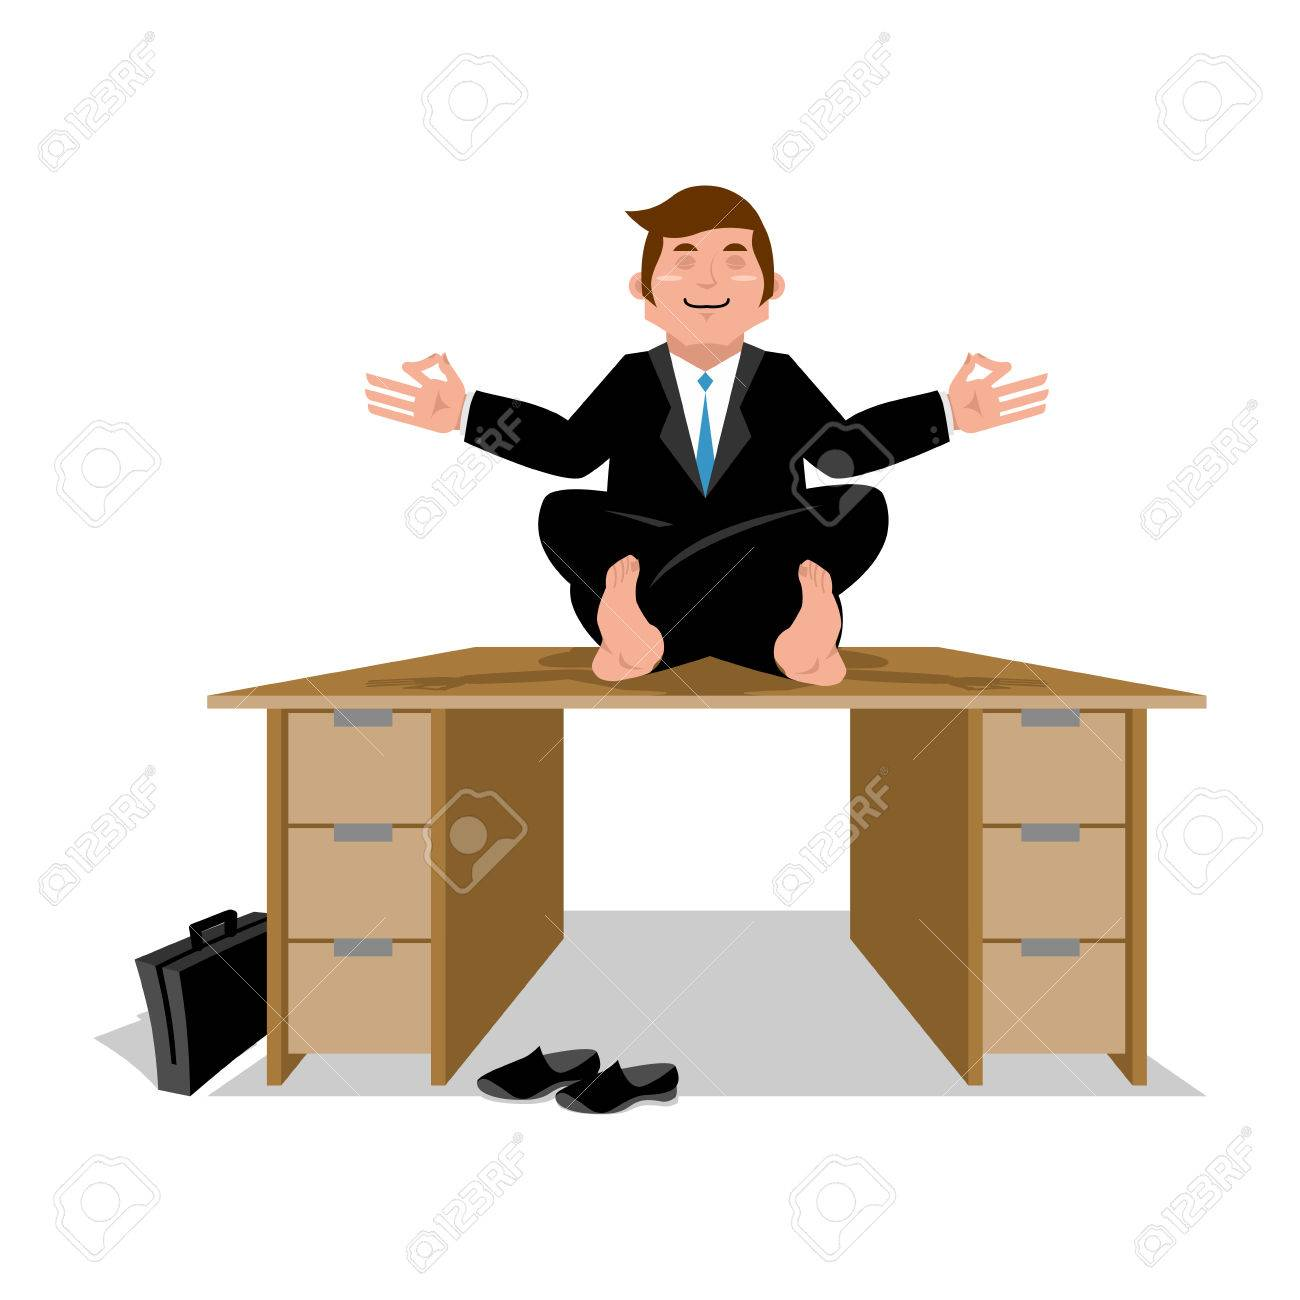 meditation businessman office. enlightenment office worker. business yoga. businessman meditating on table. manager sitting in lotus position. meditation